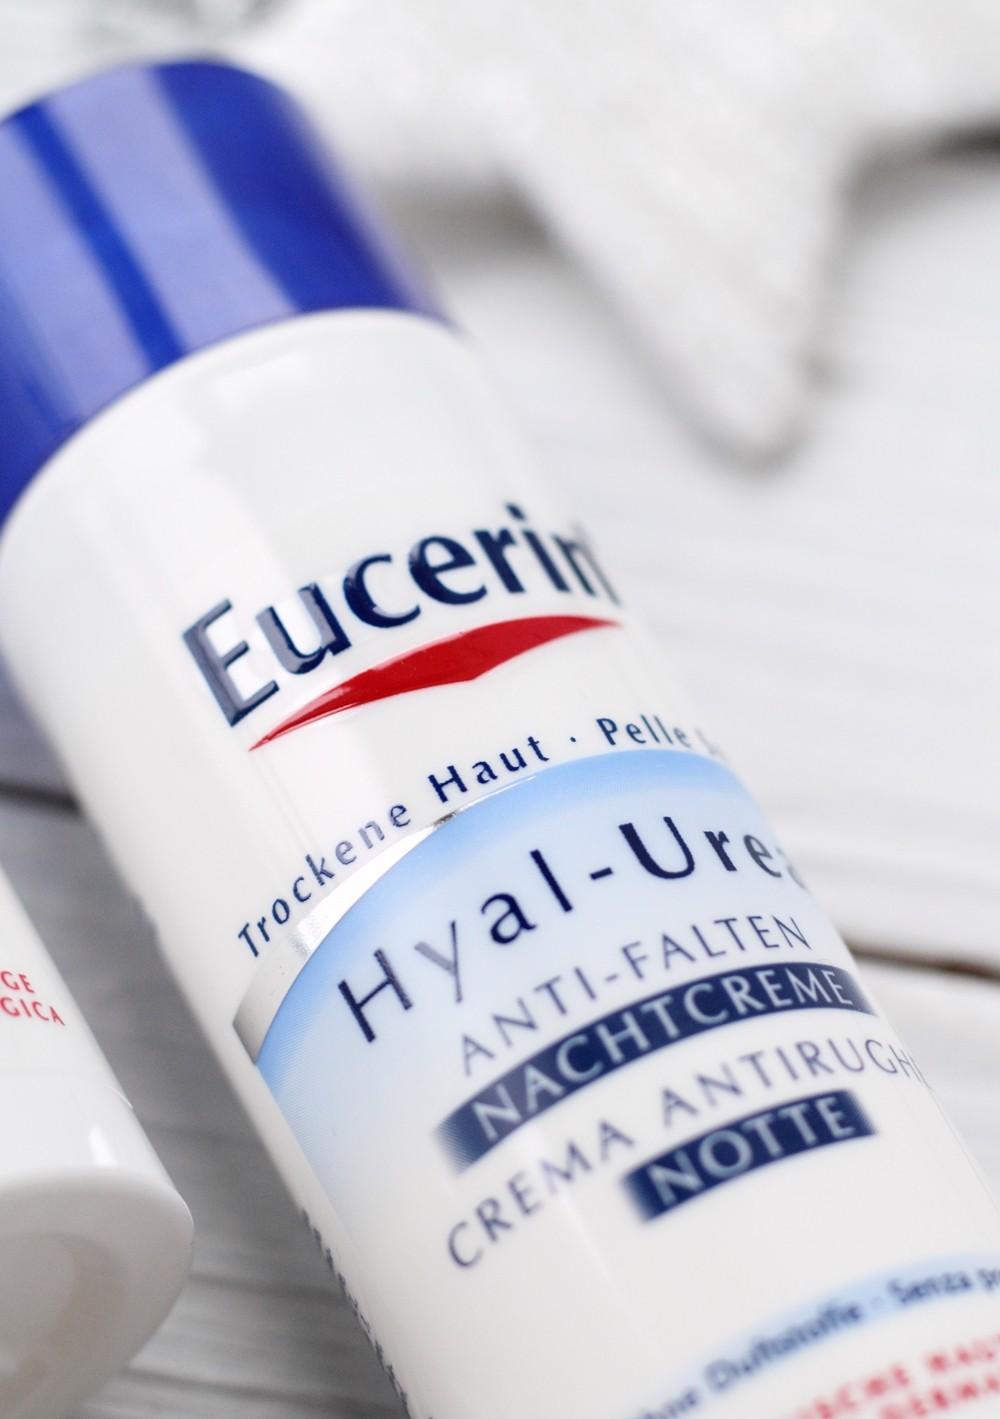 Eucerin Hyal Urea Antifalten Nachtcreme trockene Haut